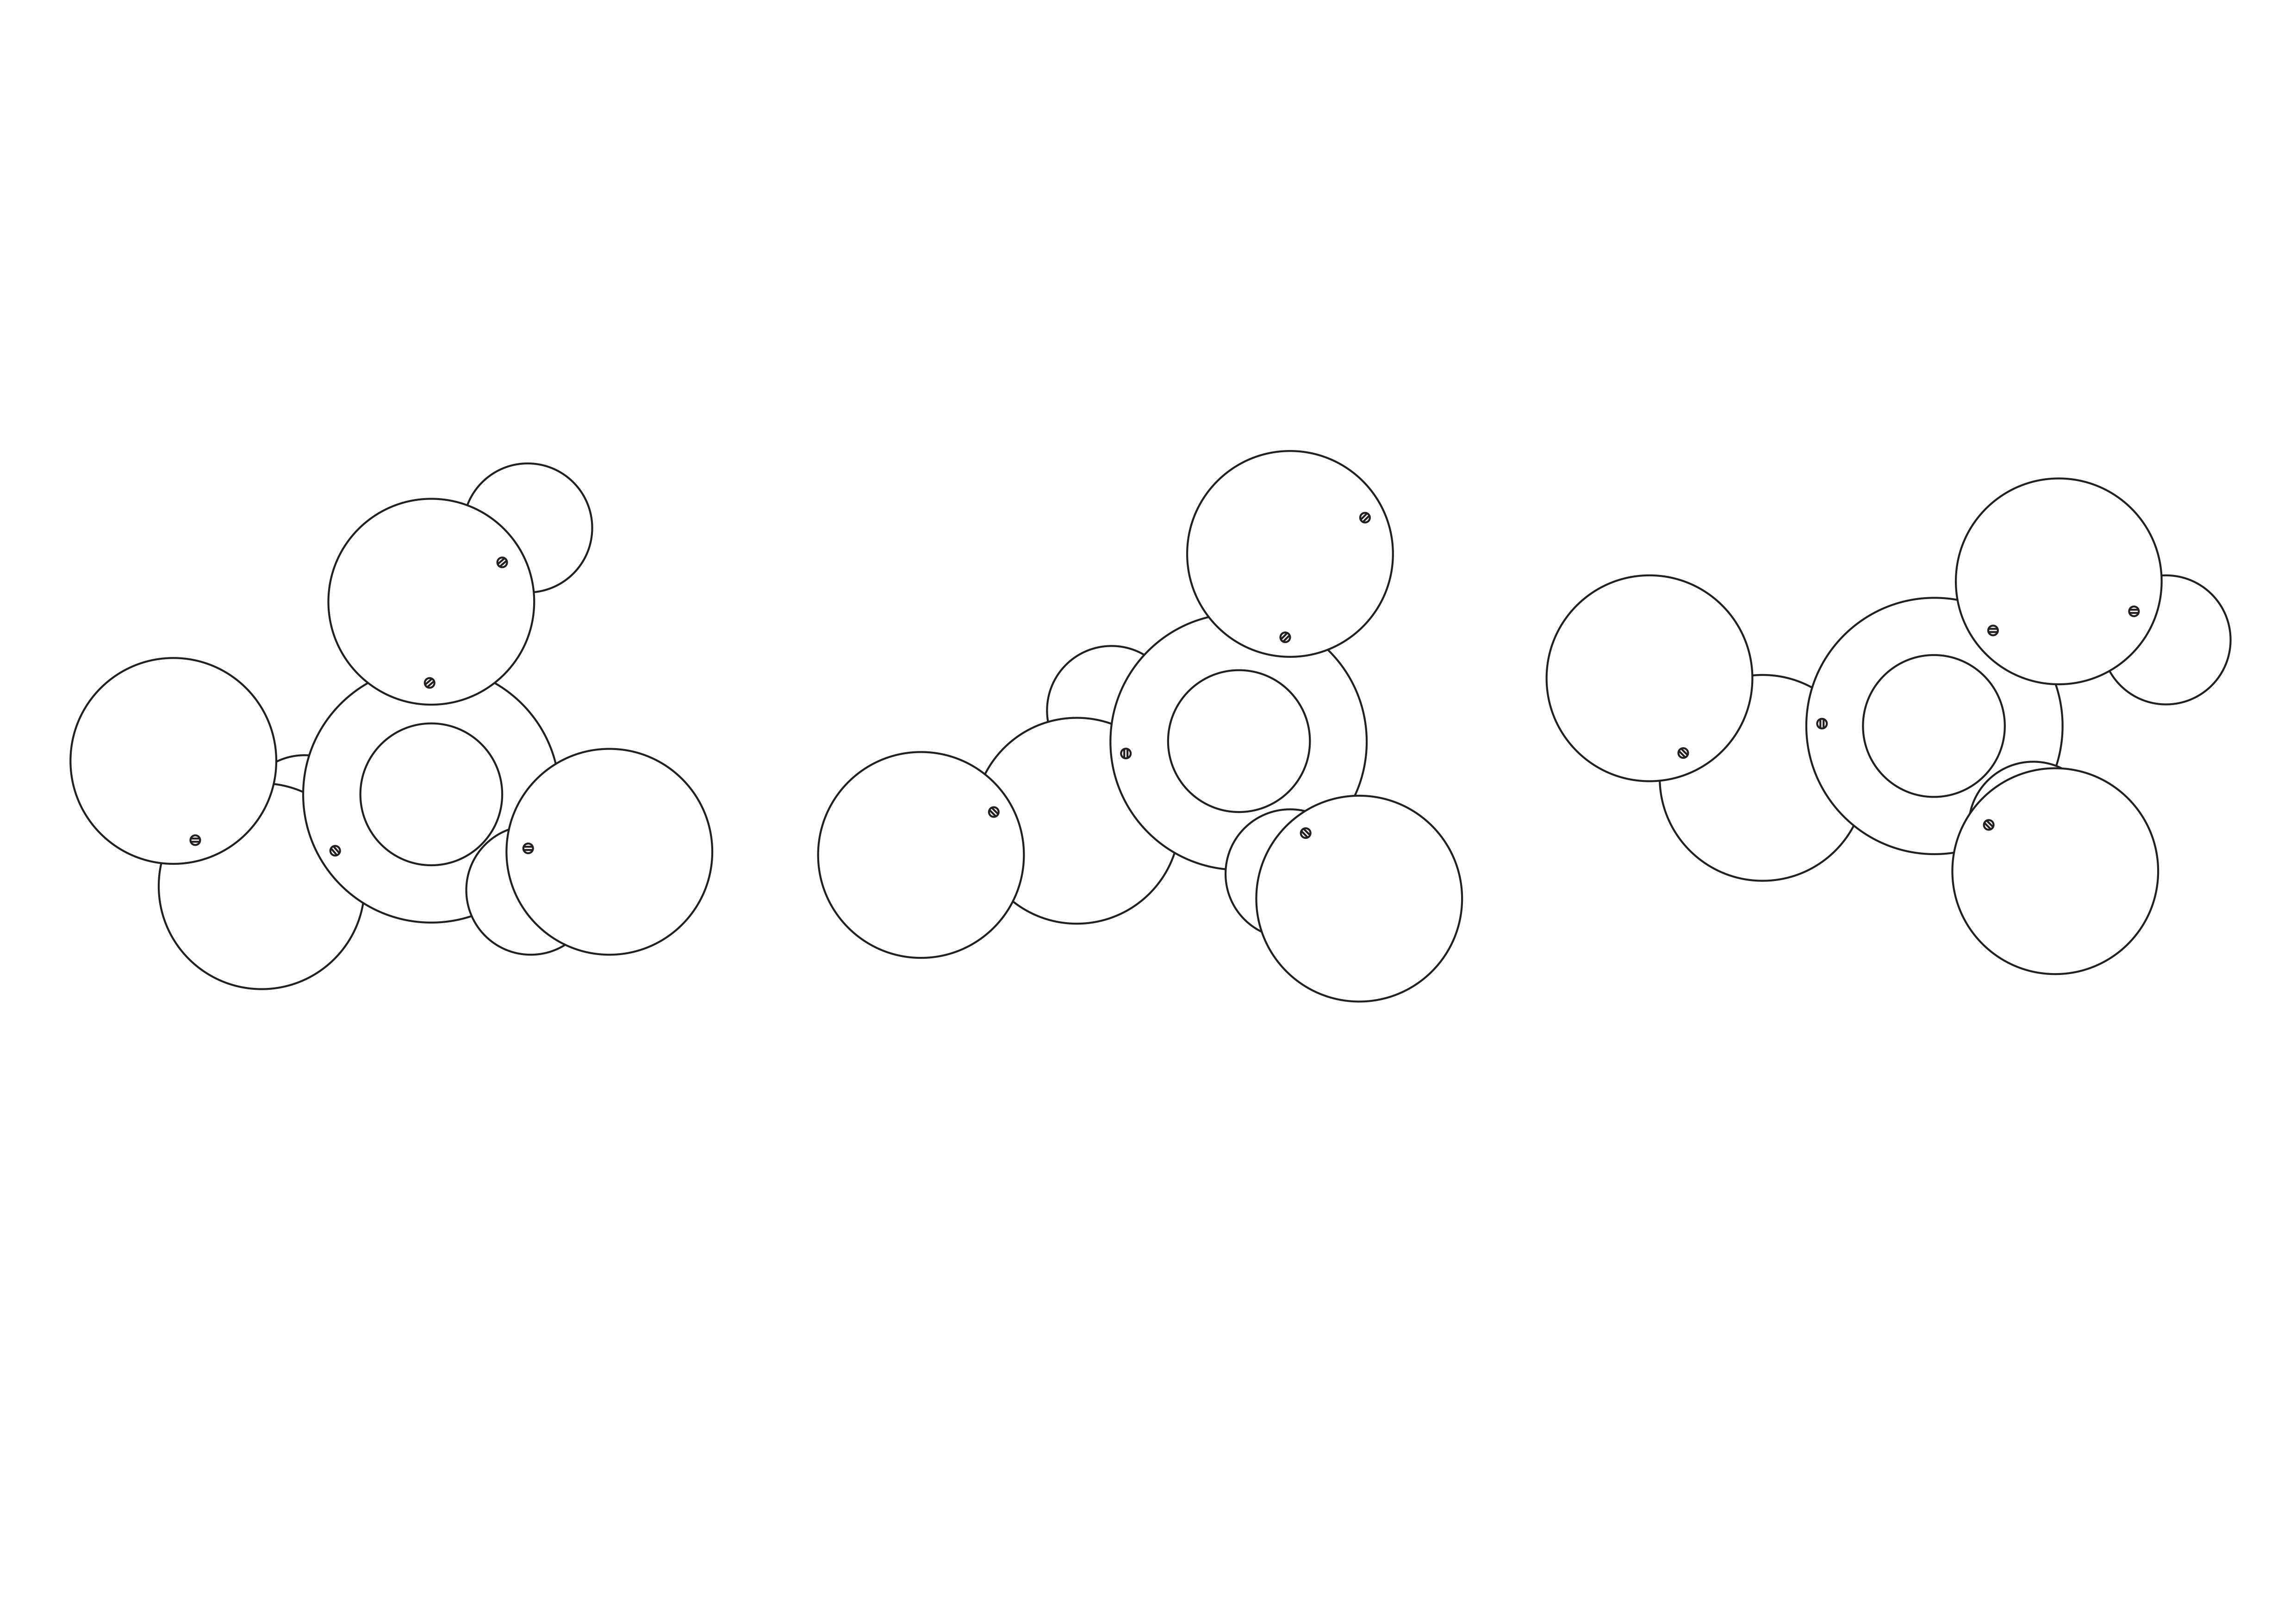 Overlap_configurations